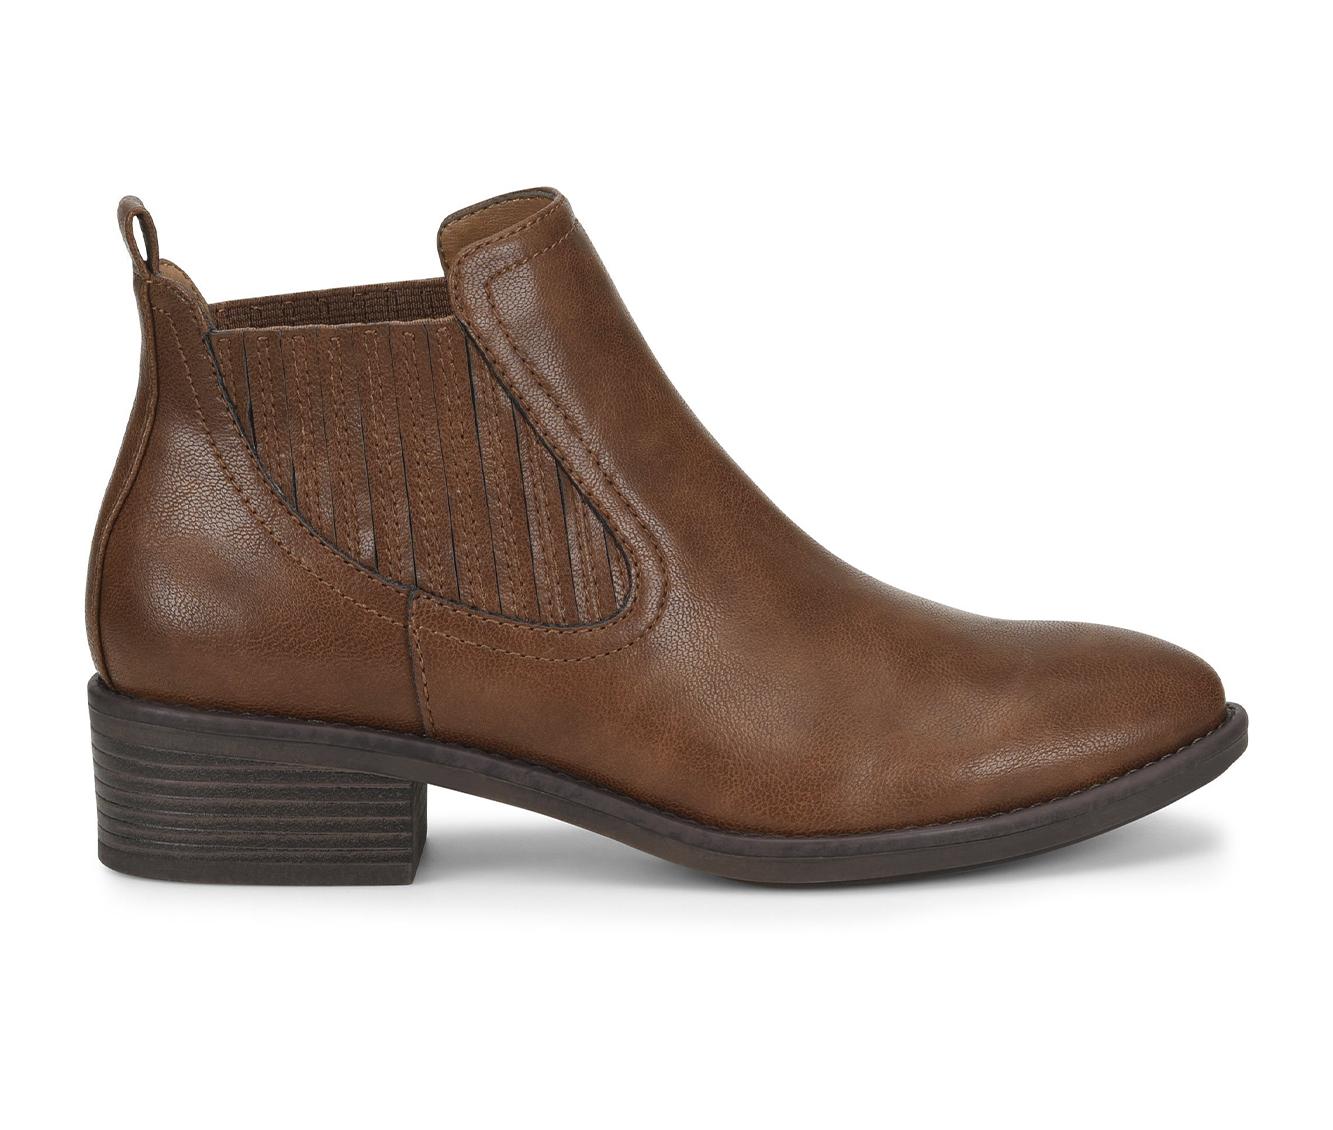 EuroSoft Colisa Women's Boots (Brown - Faux Leather)